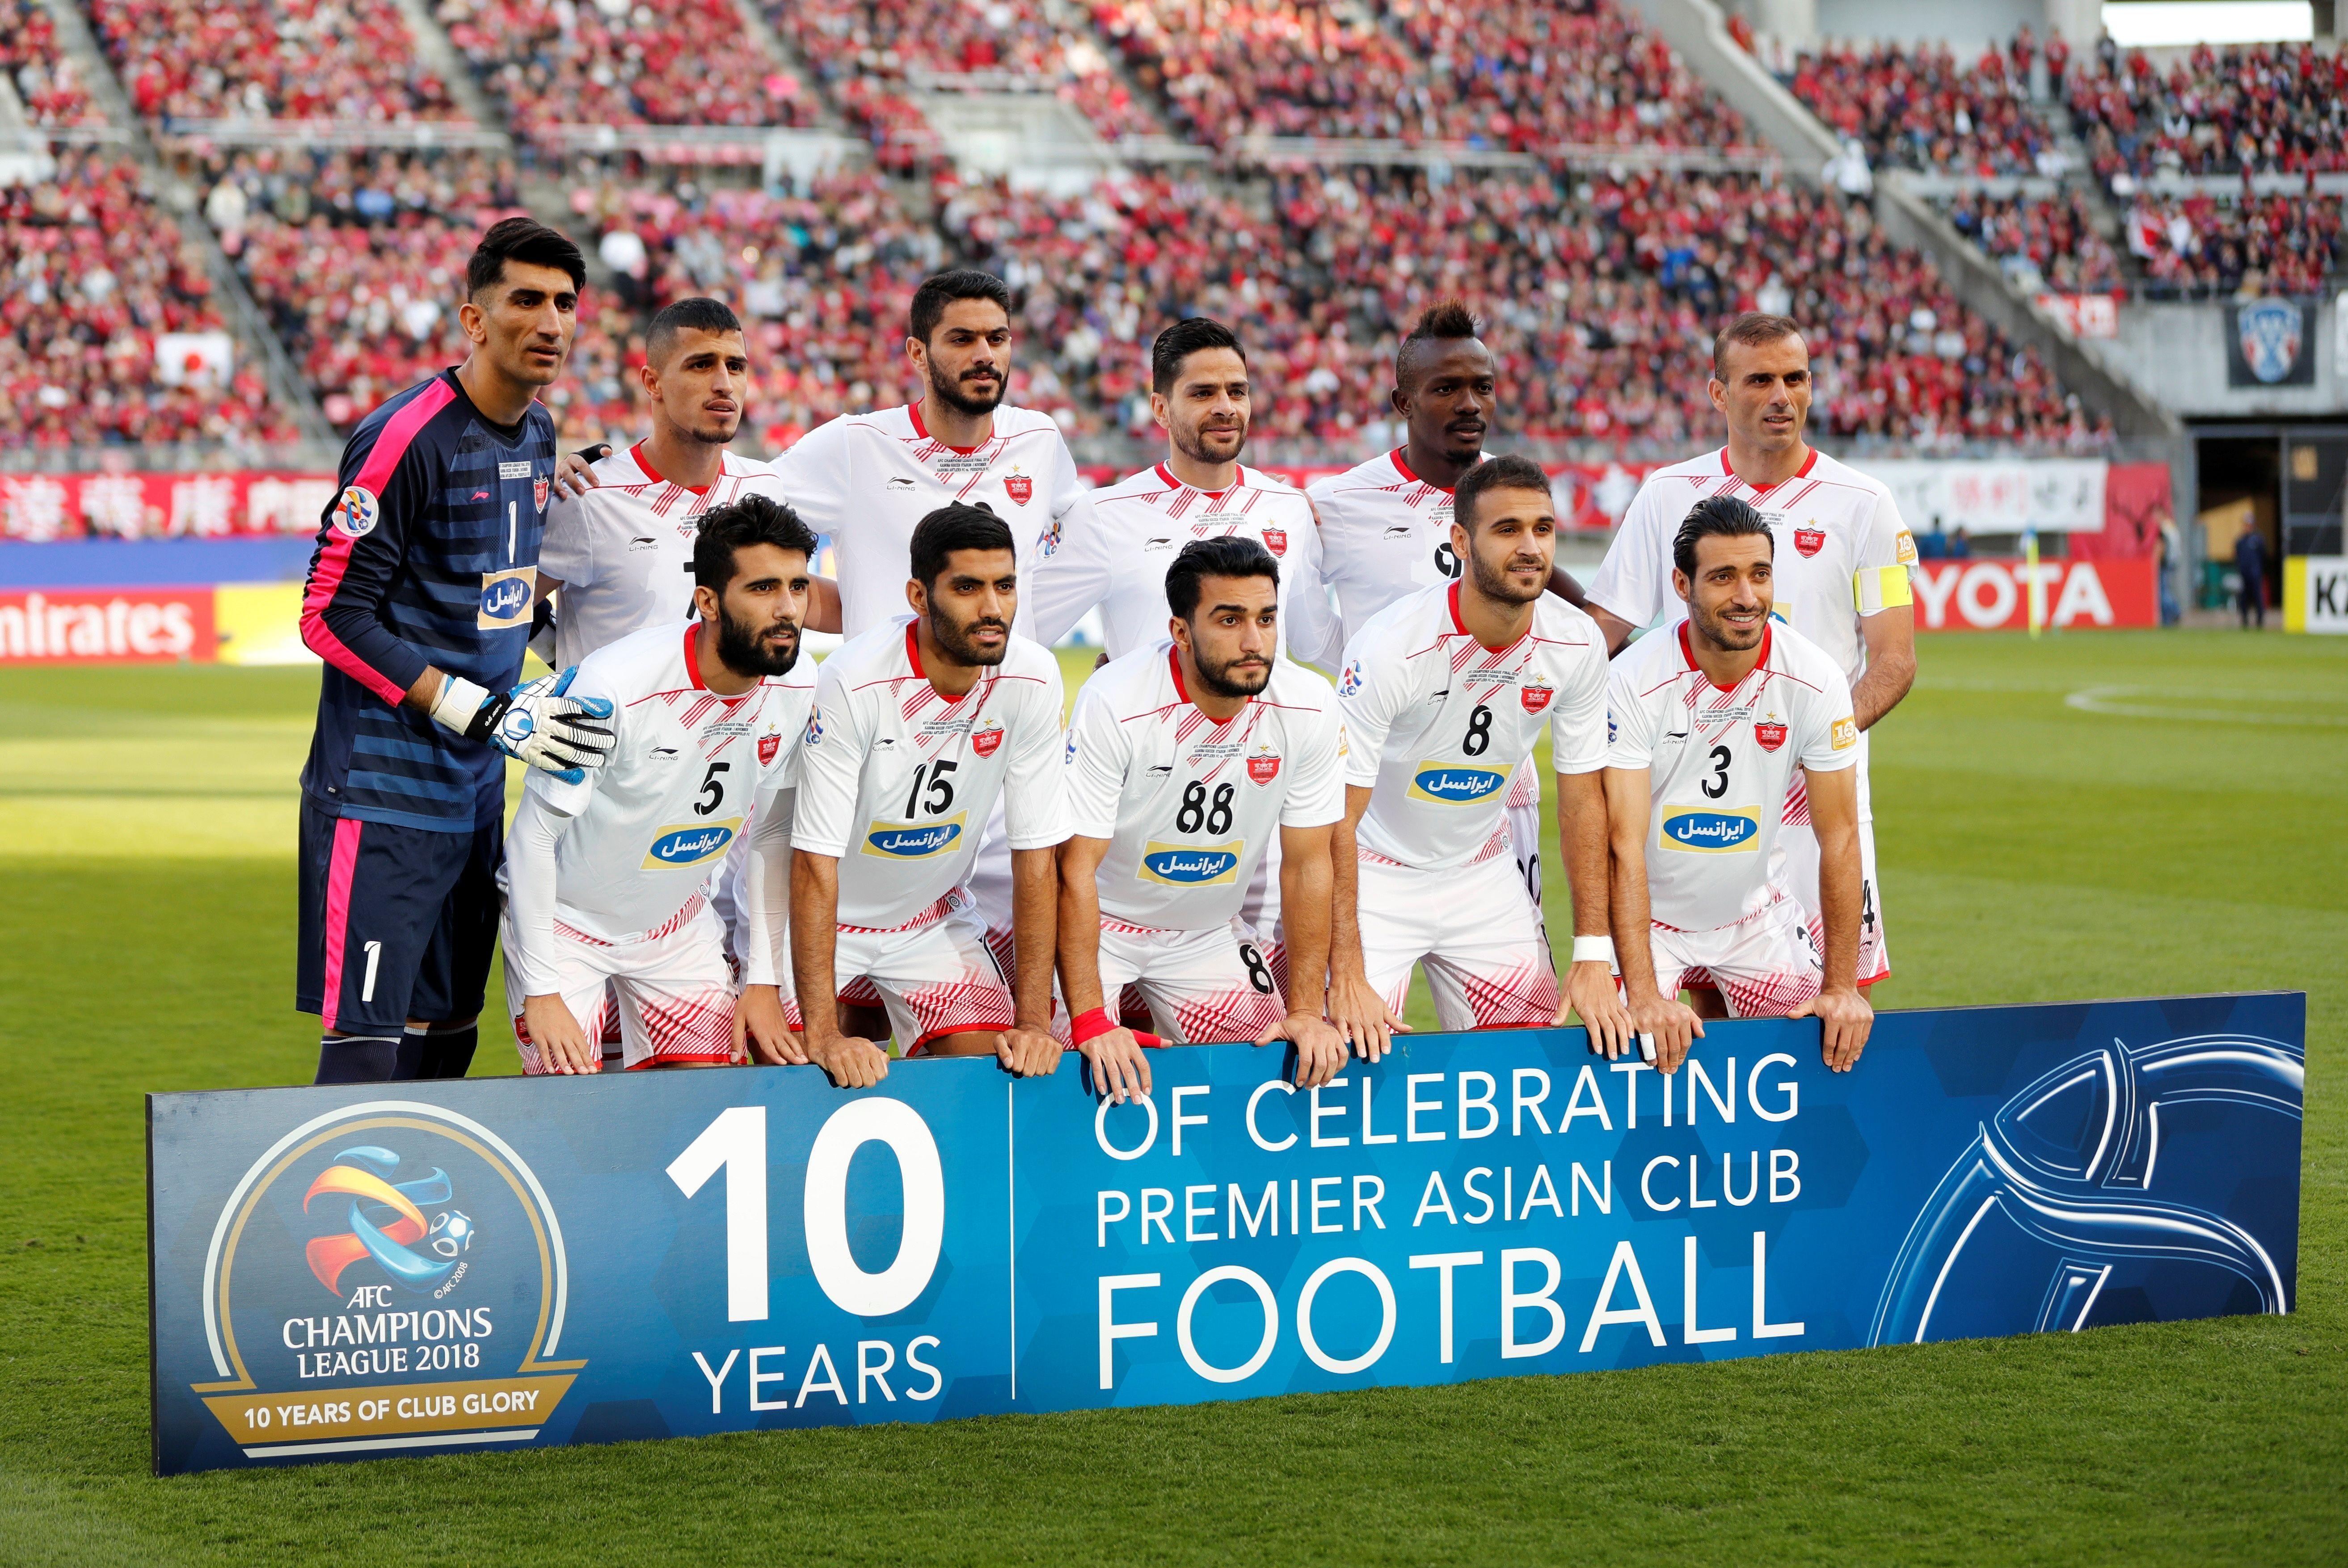 Soccer Persepolis Set Up Semi Final Clash With Al Nassr Kayhan Life